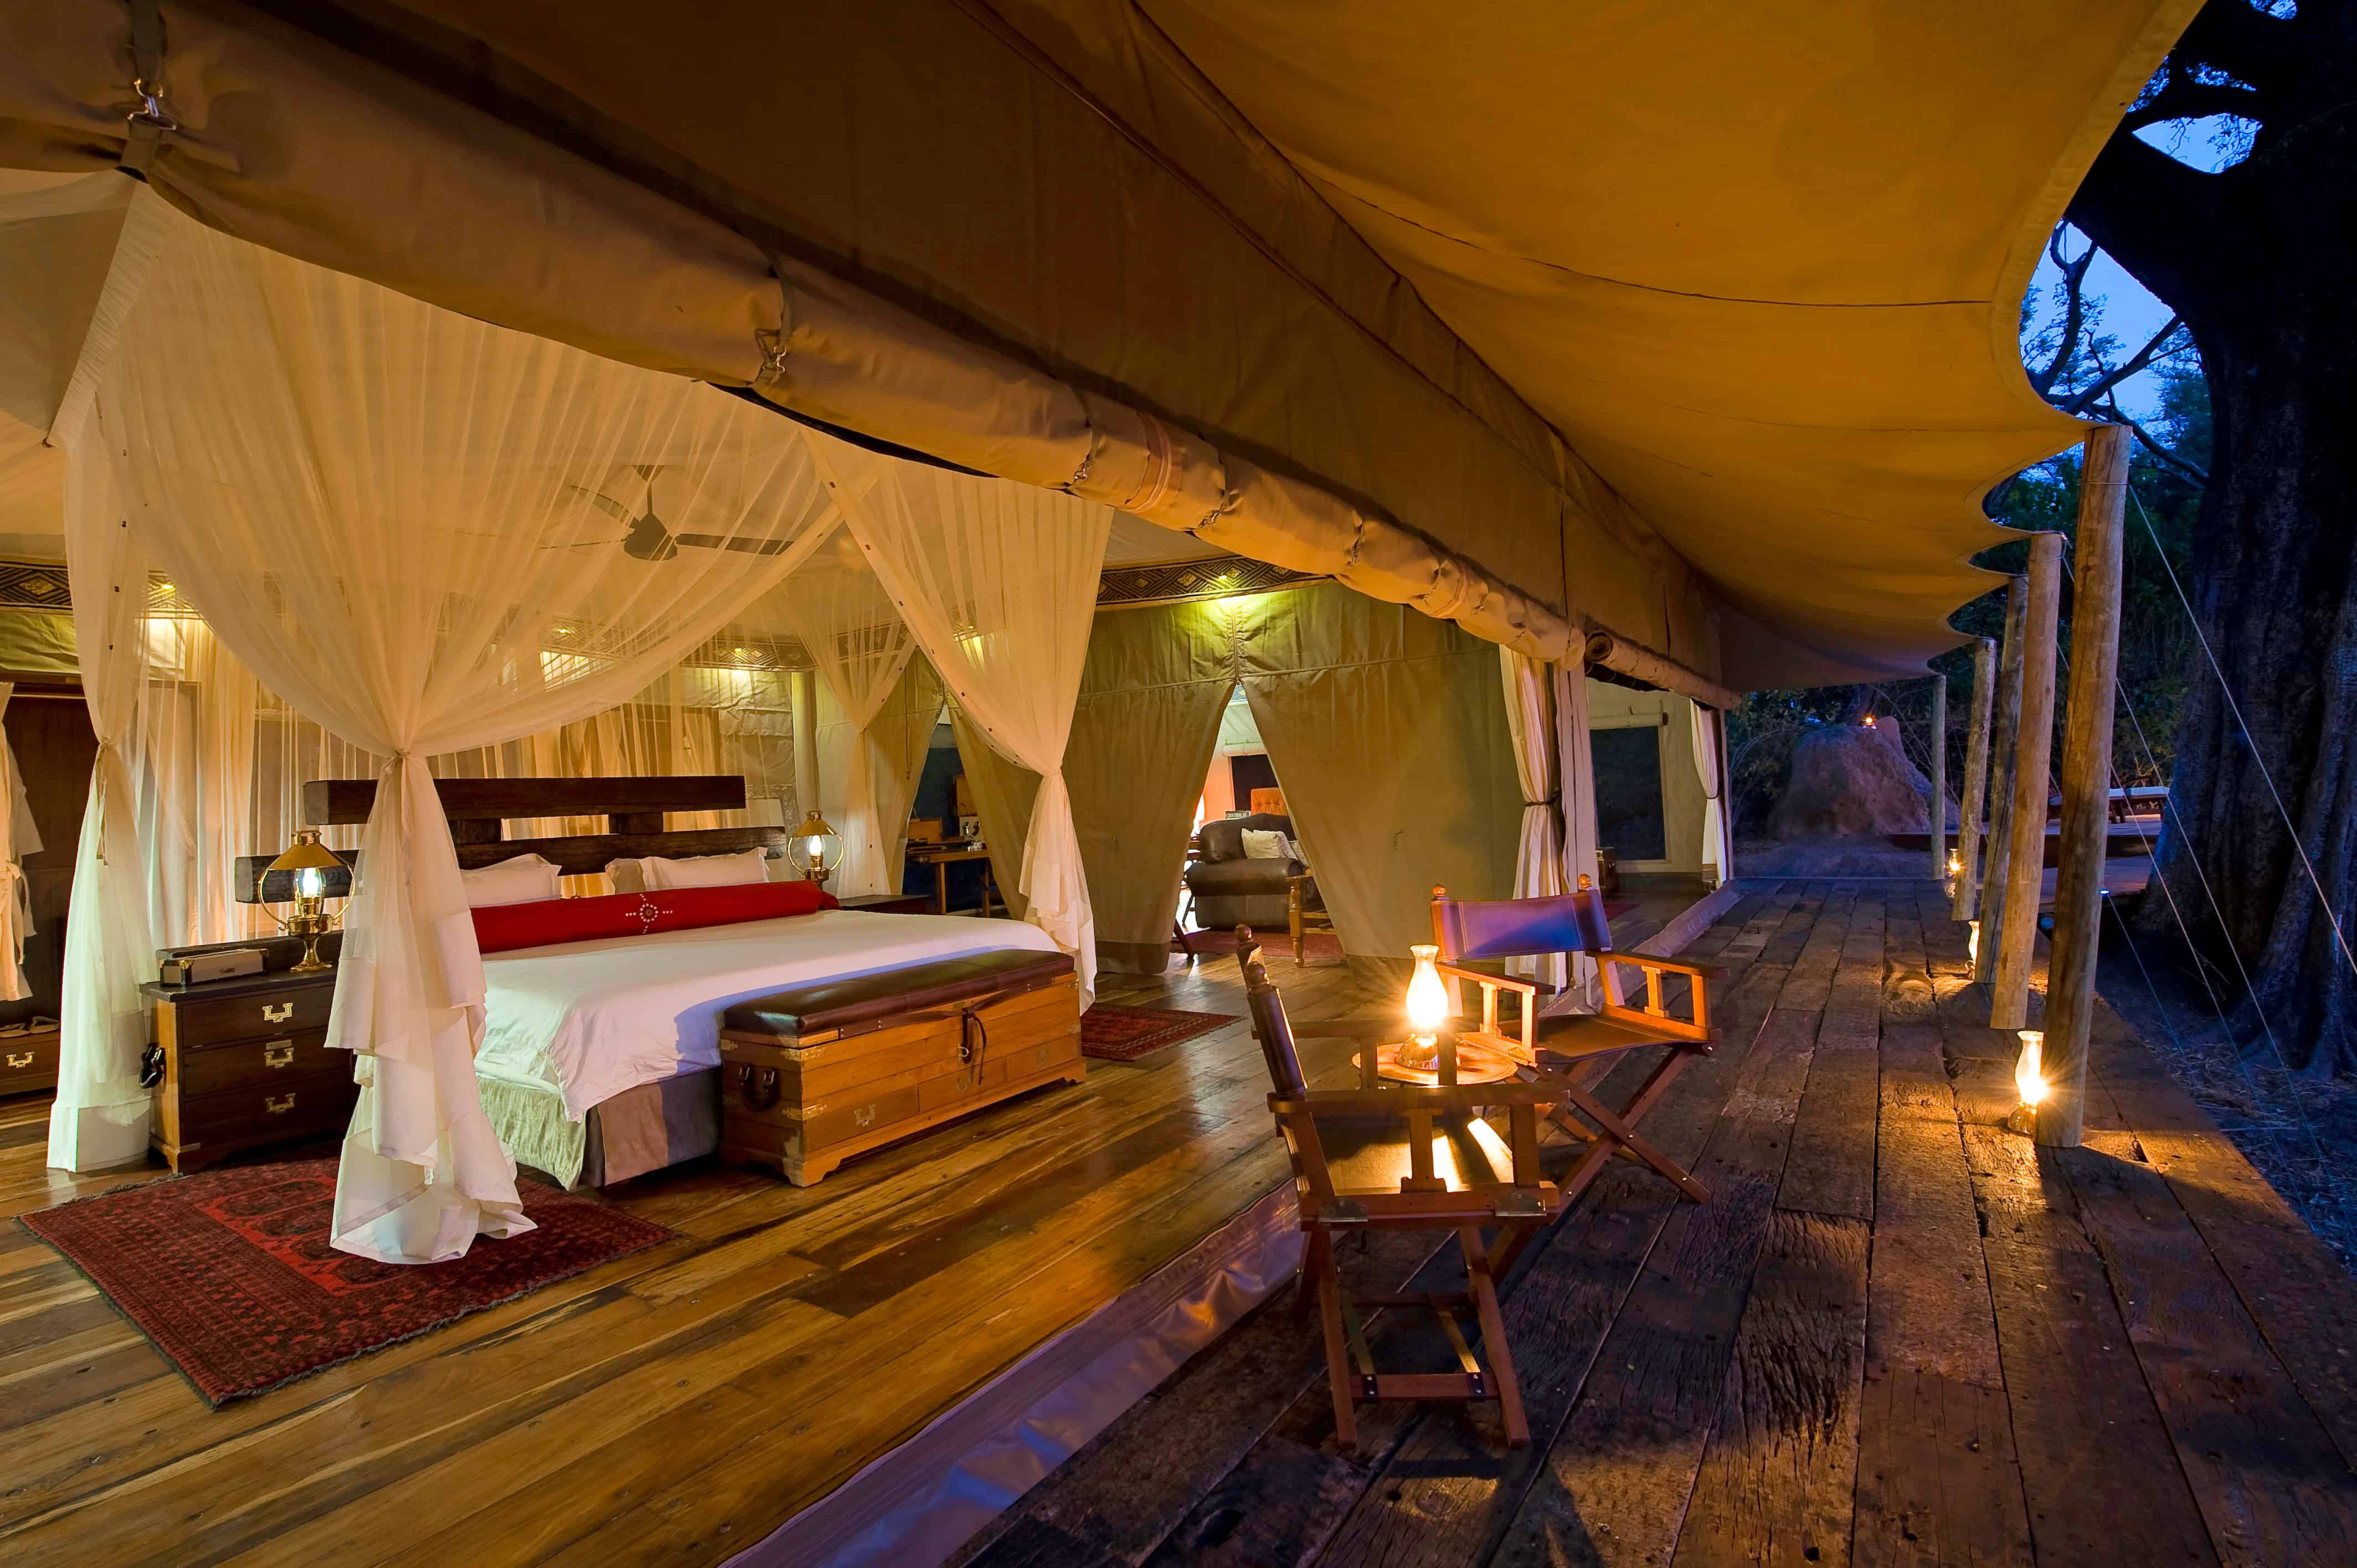 TOP 10 BEST LUXURY SAFARI CAMPS IN AFRICA